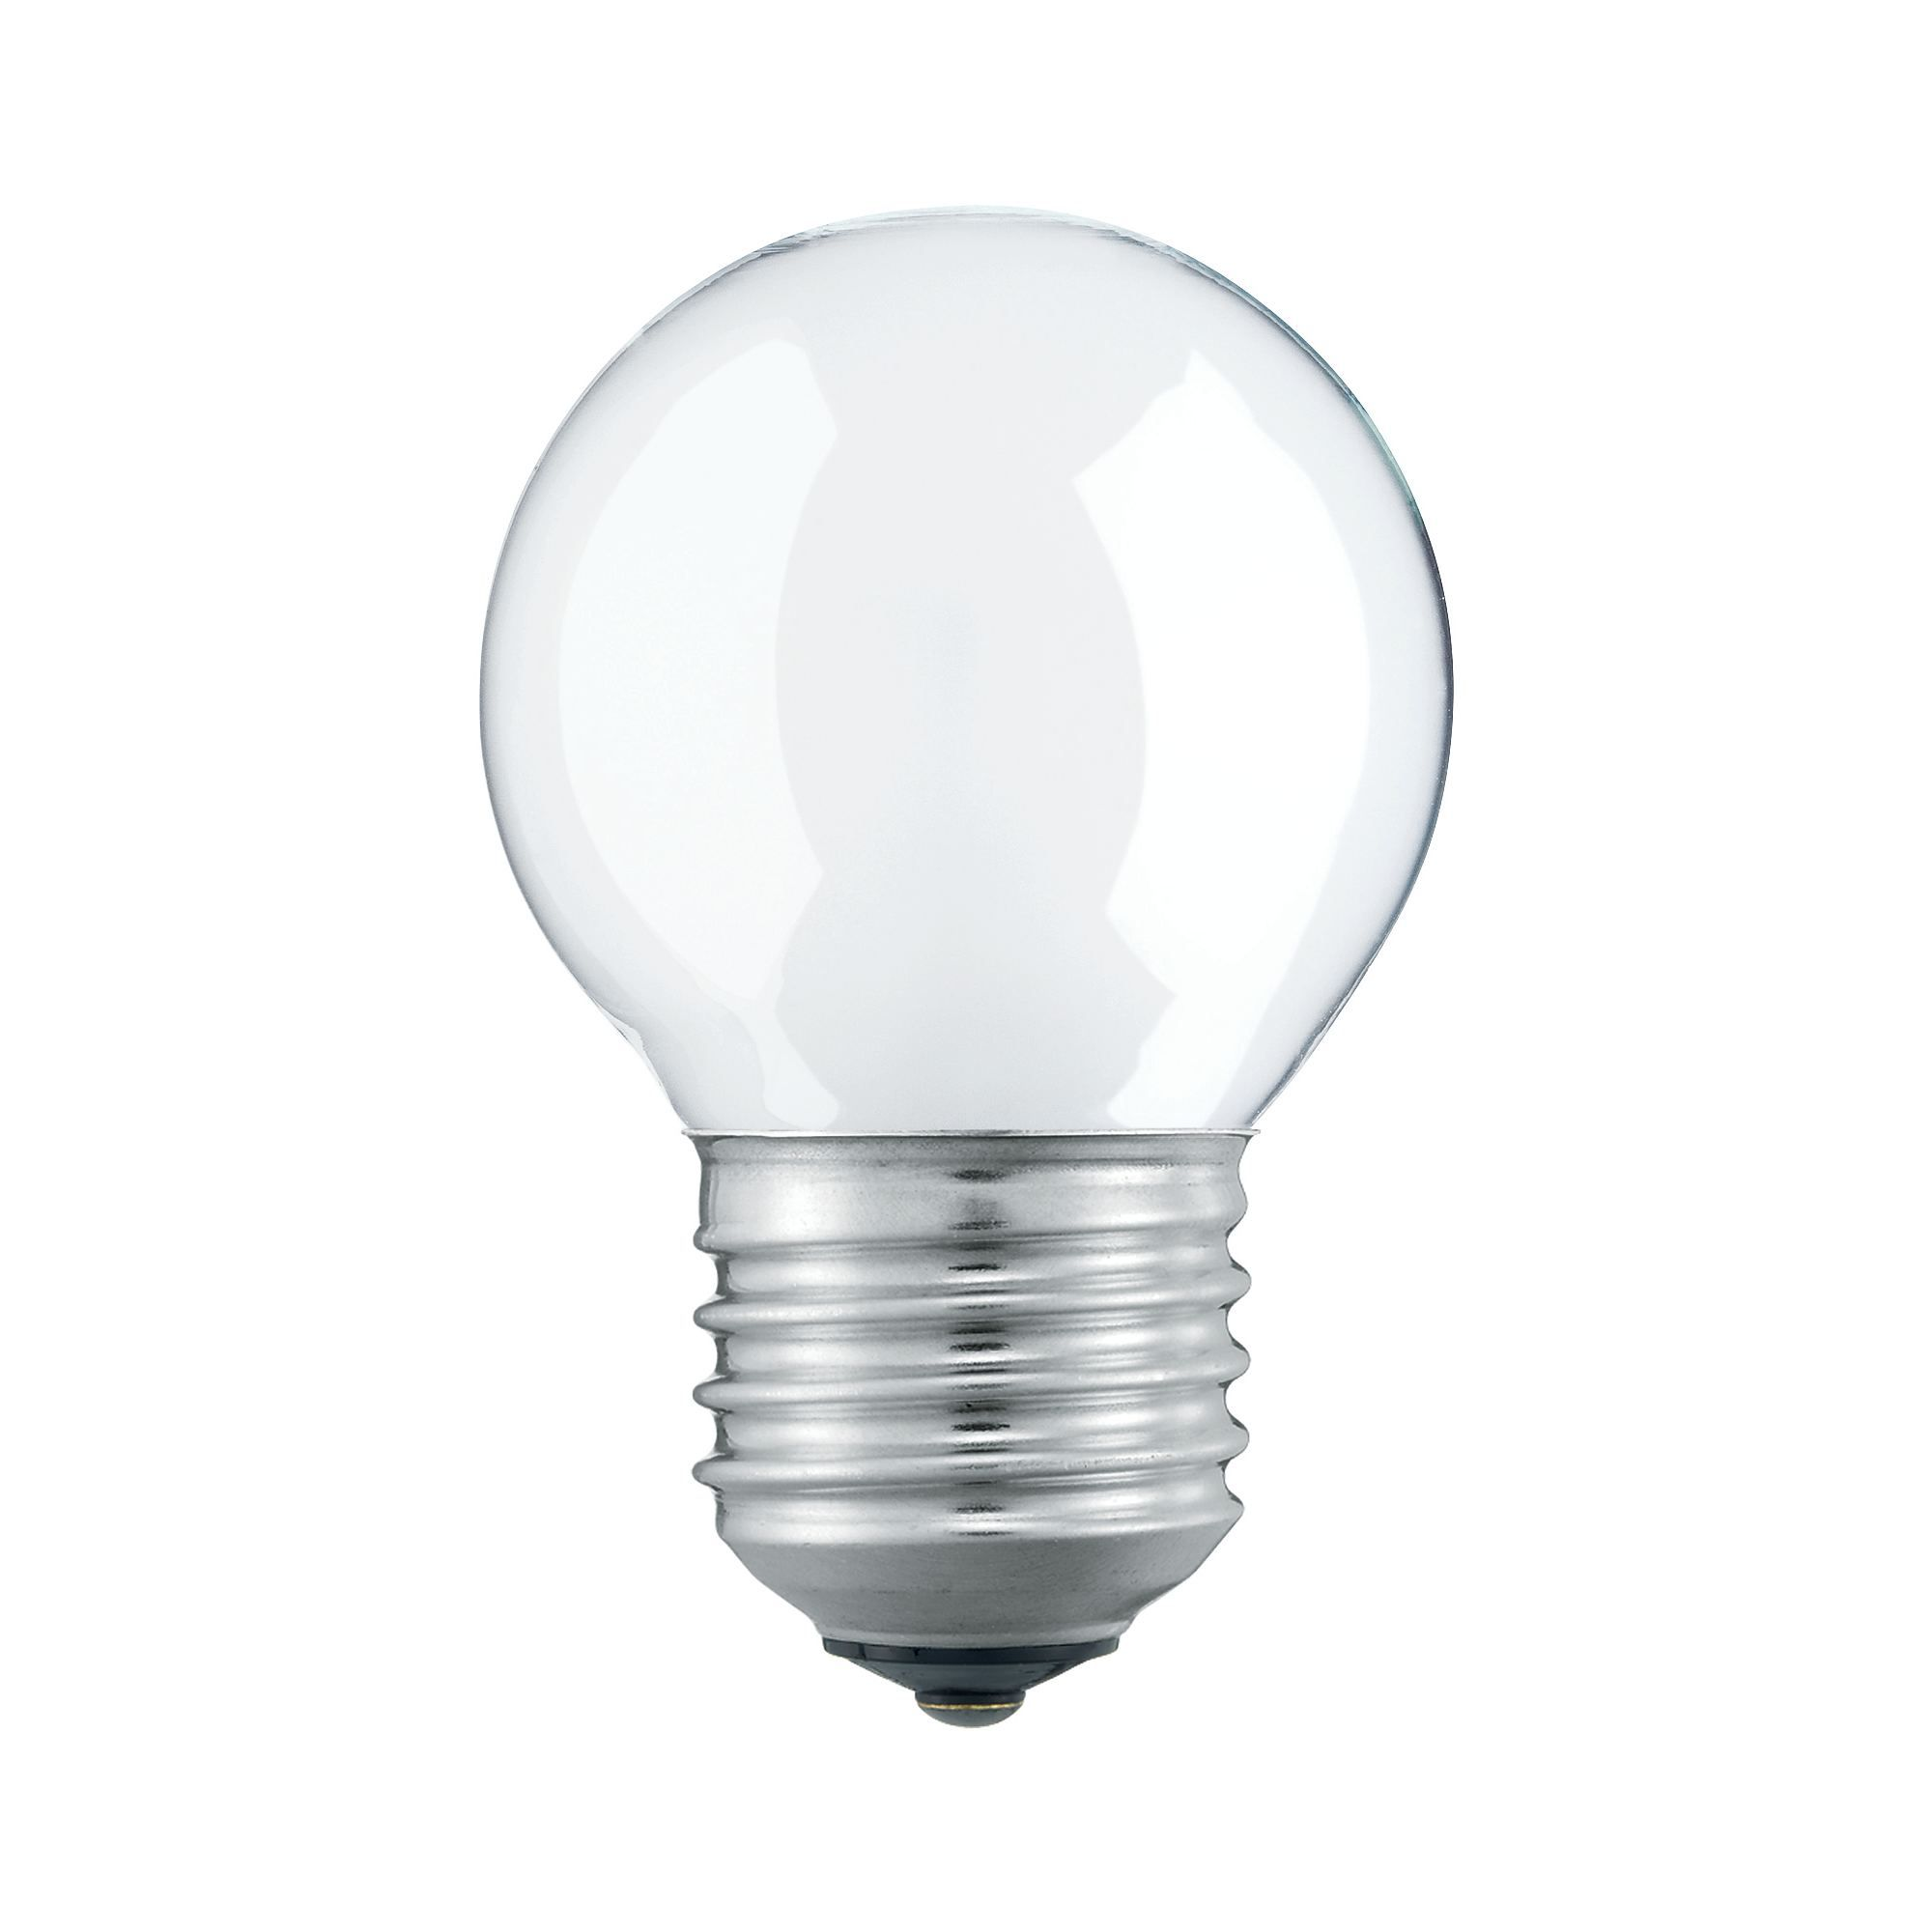 Купить Лампа накаливания Philips Stan 25W E27 230V P45 FR 1CT/10X10F матовая